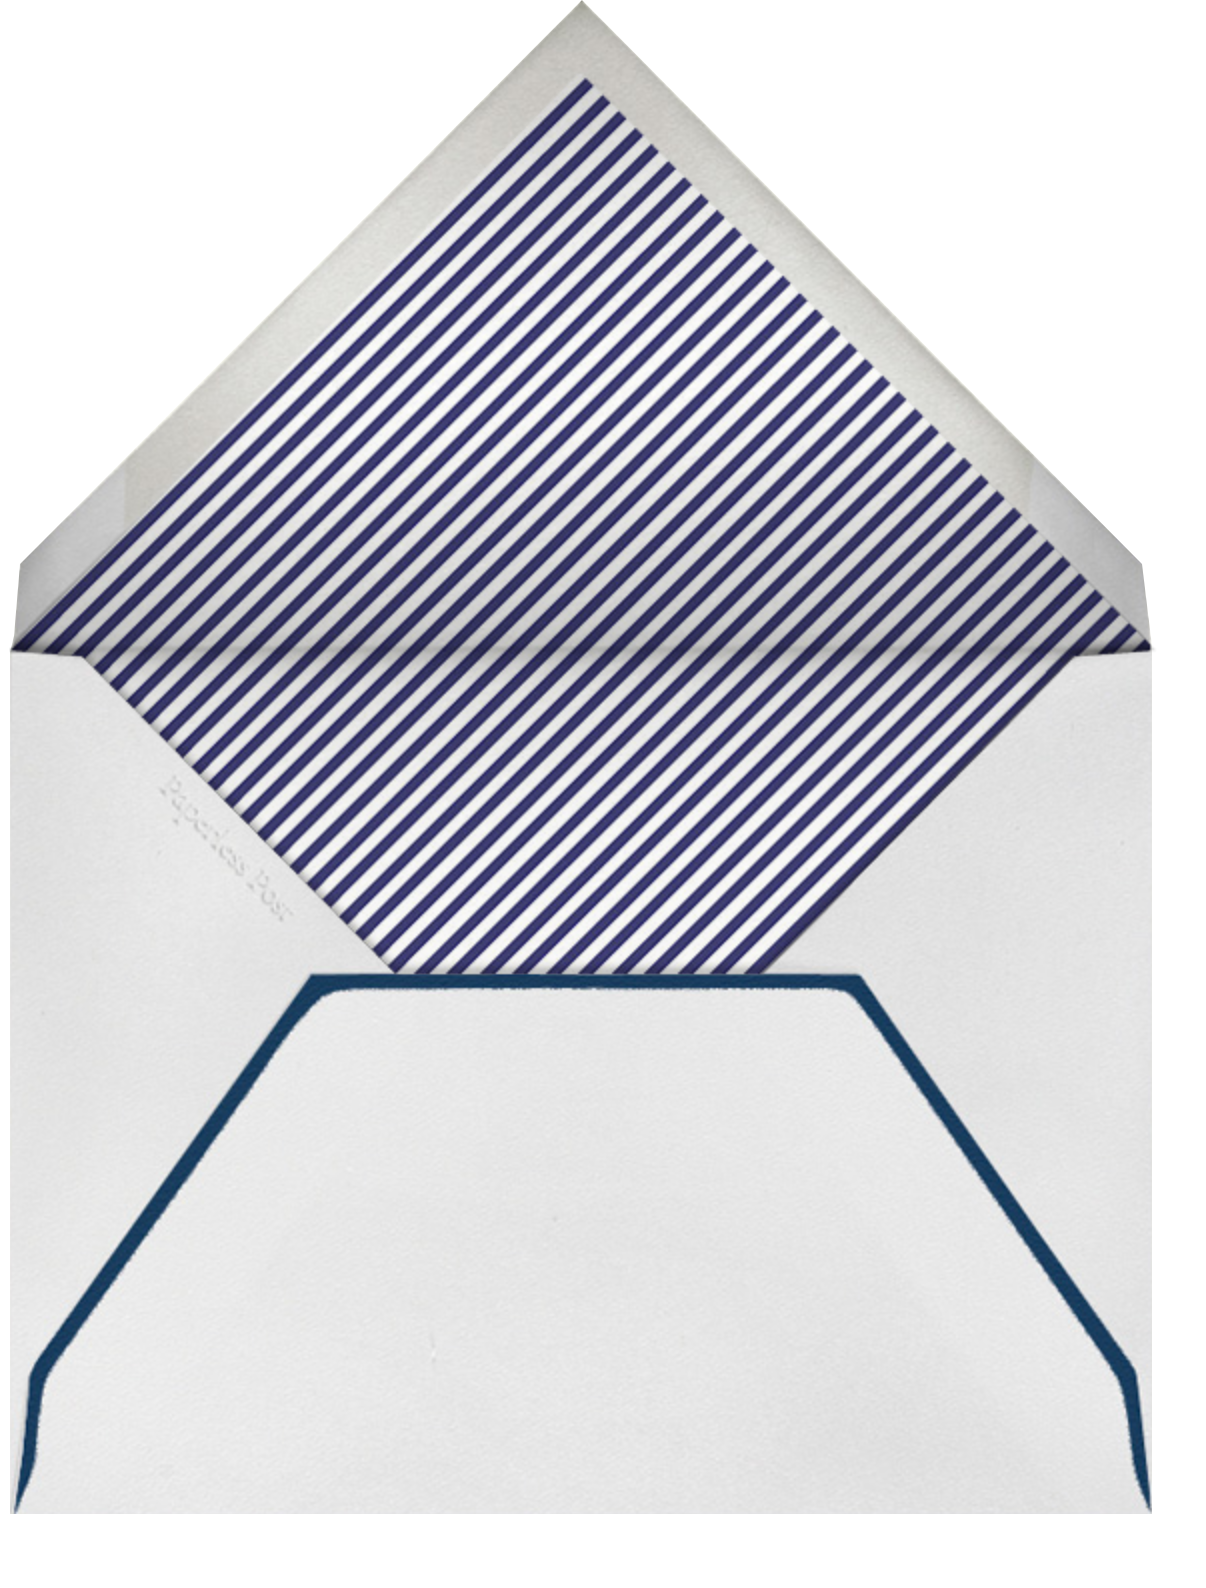 Mr. Porter's Ribbons - Navy - Mr. Boddington's Studio - null - envelope back